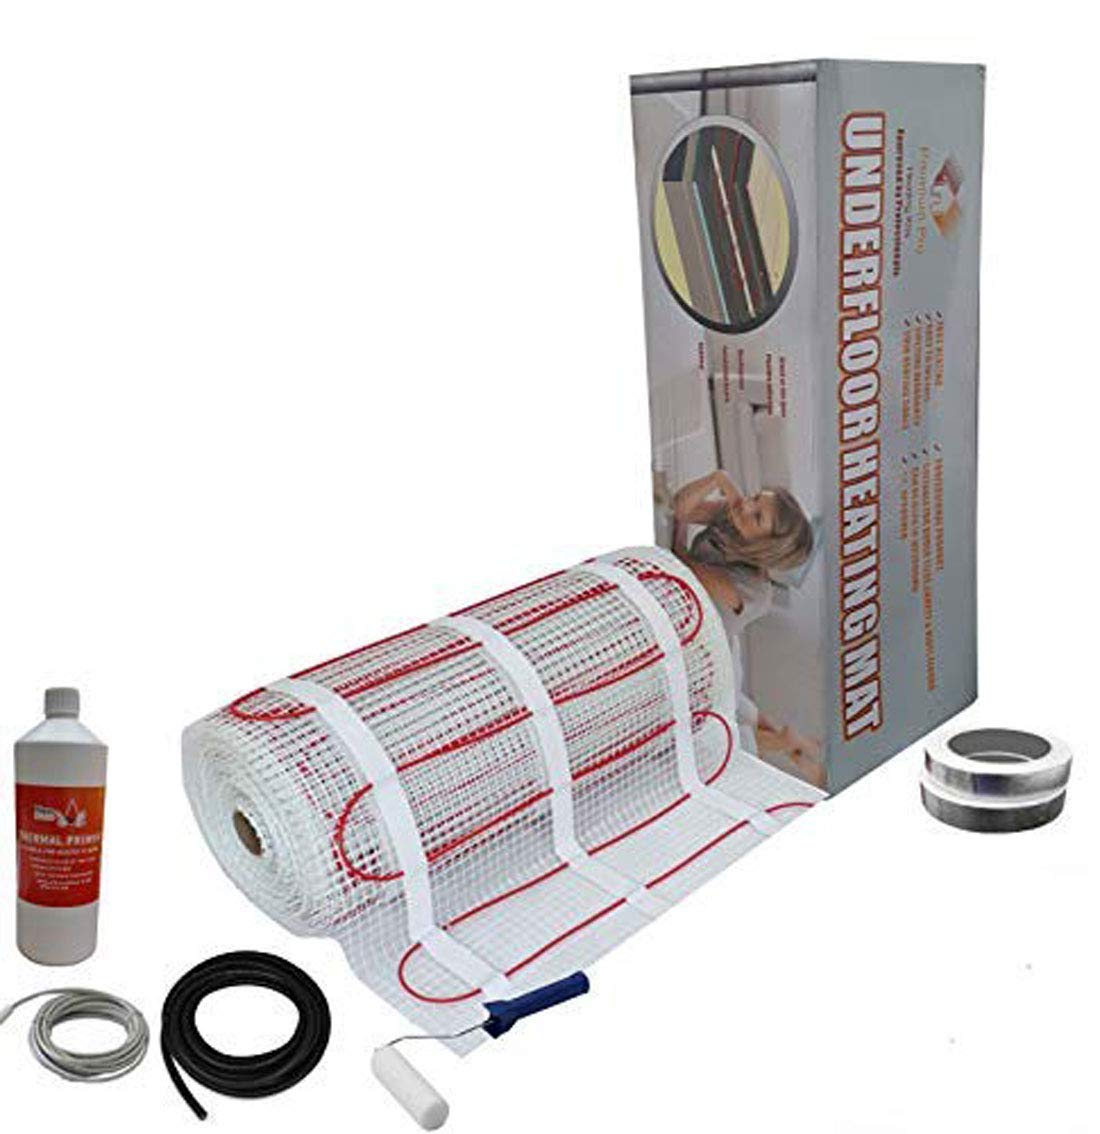 Black Touch Thermostat 10.0m2 Electric Underfloor Pro Elite Heating kit 150w